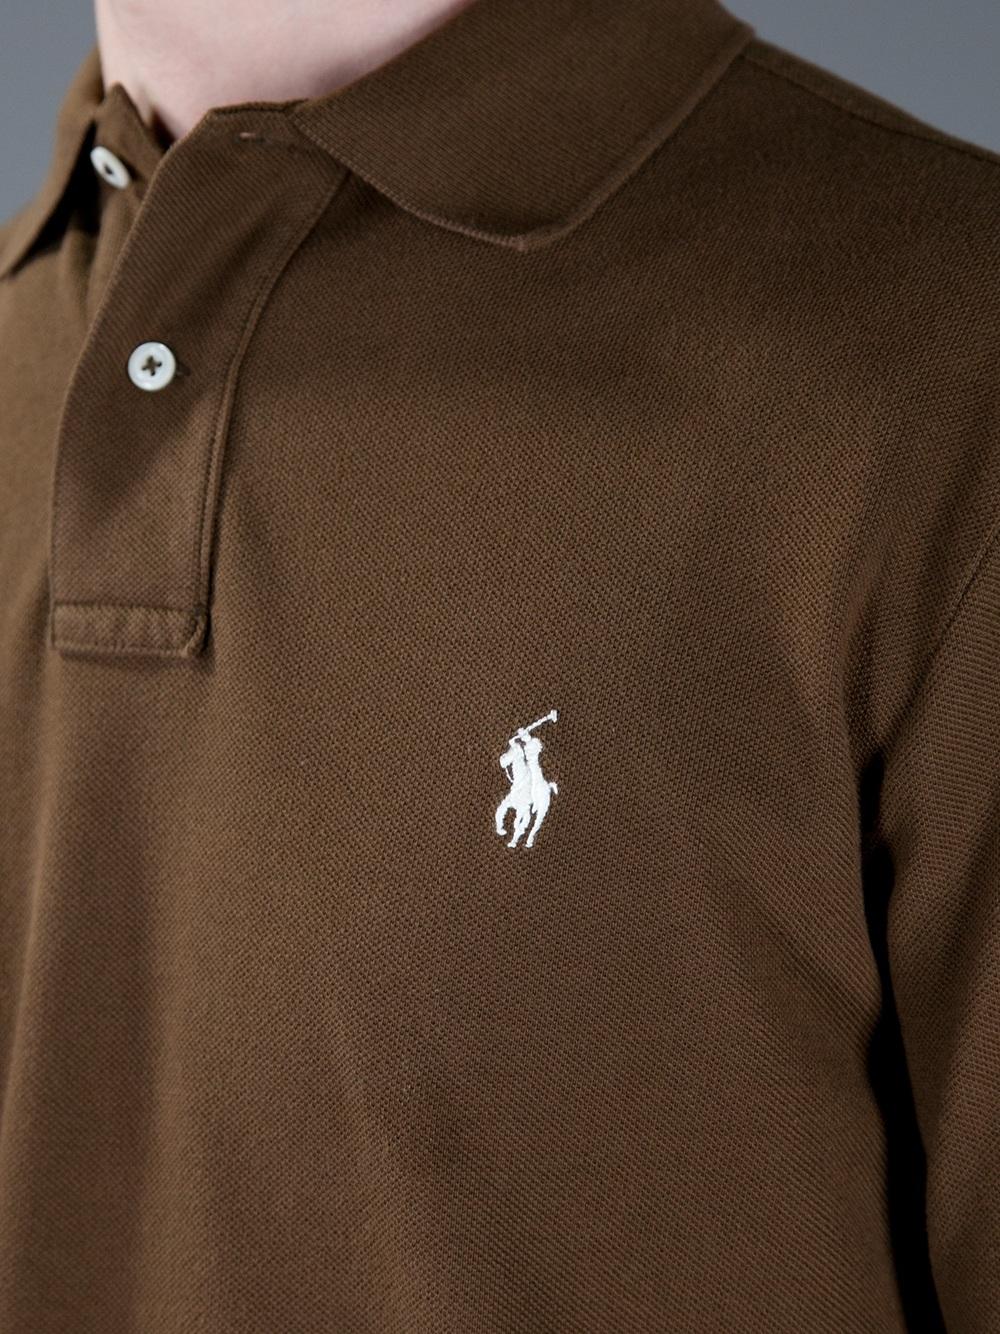 Lyst Ralph Lauren Blue Label Long Sleeve Polo Shirt In Brown For Men